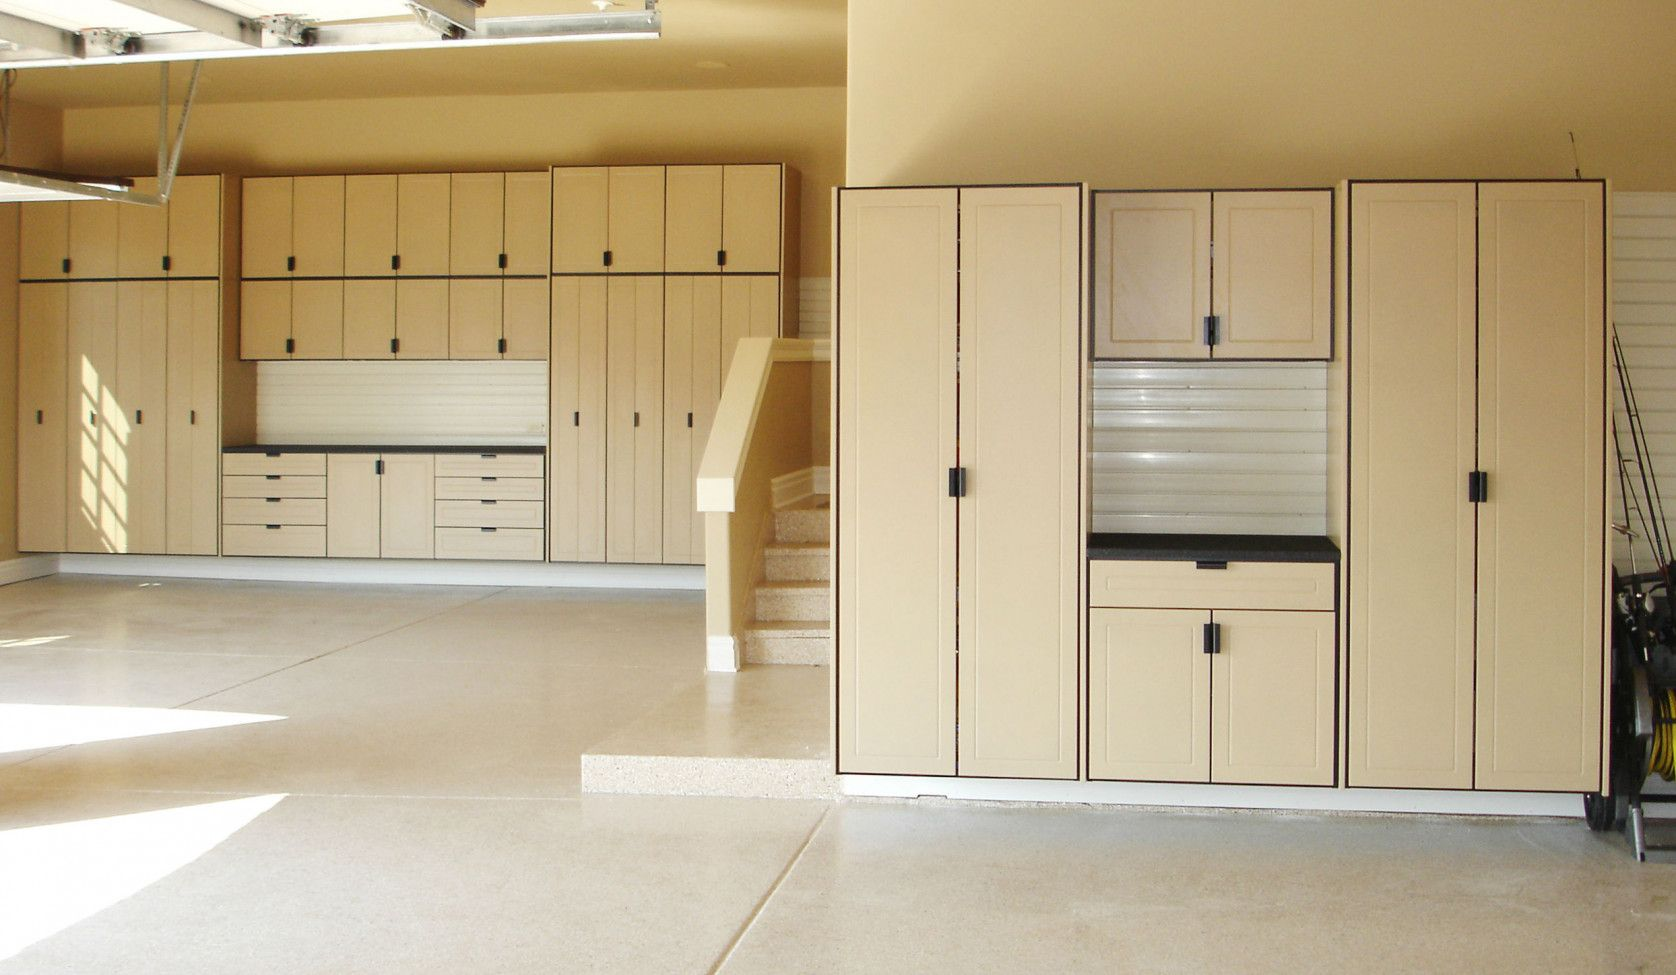 77+ Custom Garage Cabinets Storage - Kitchen Cabinet Lighting Ideas Check more at  & 77+ Custom Garage Cabinets Storage - Kitchen Cabinet Lighting Ideas ...